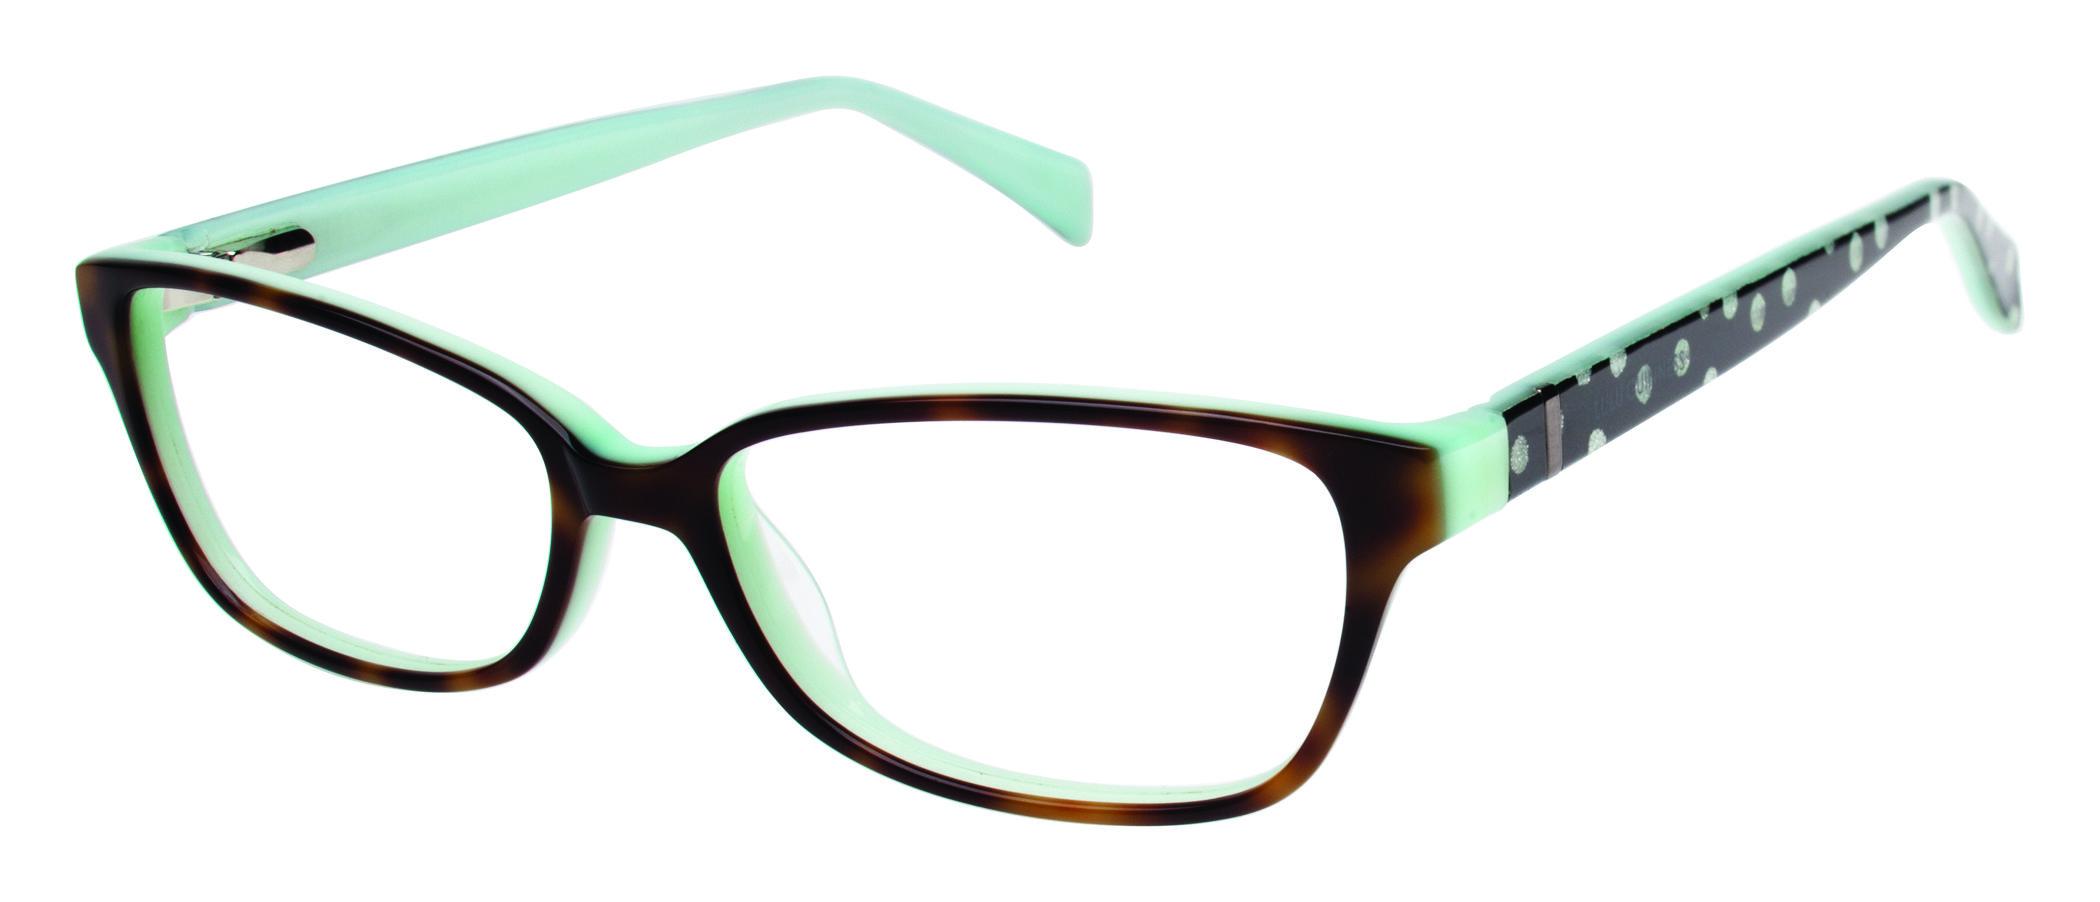 Luscious Lulu Guinness Eyewear | Pinterest | Lulu guinness, Tortoise ...